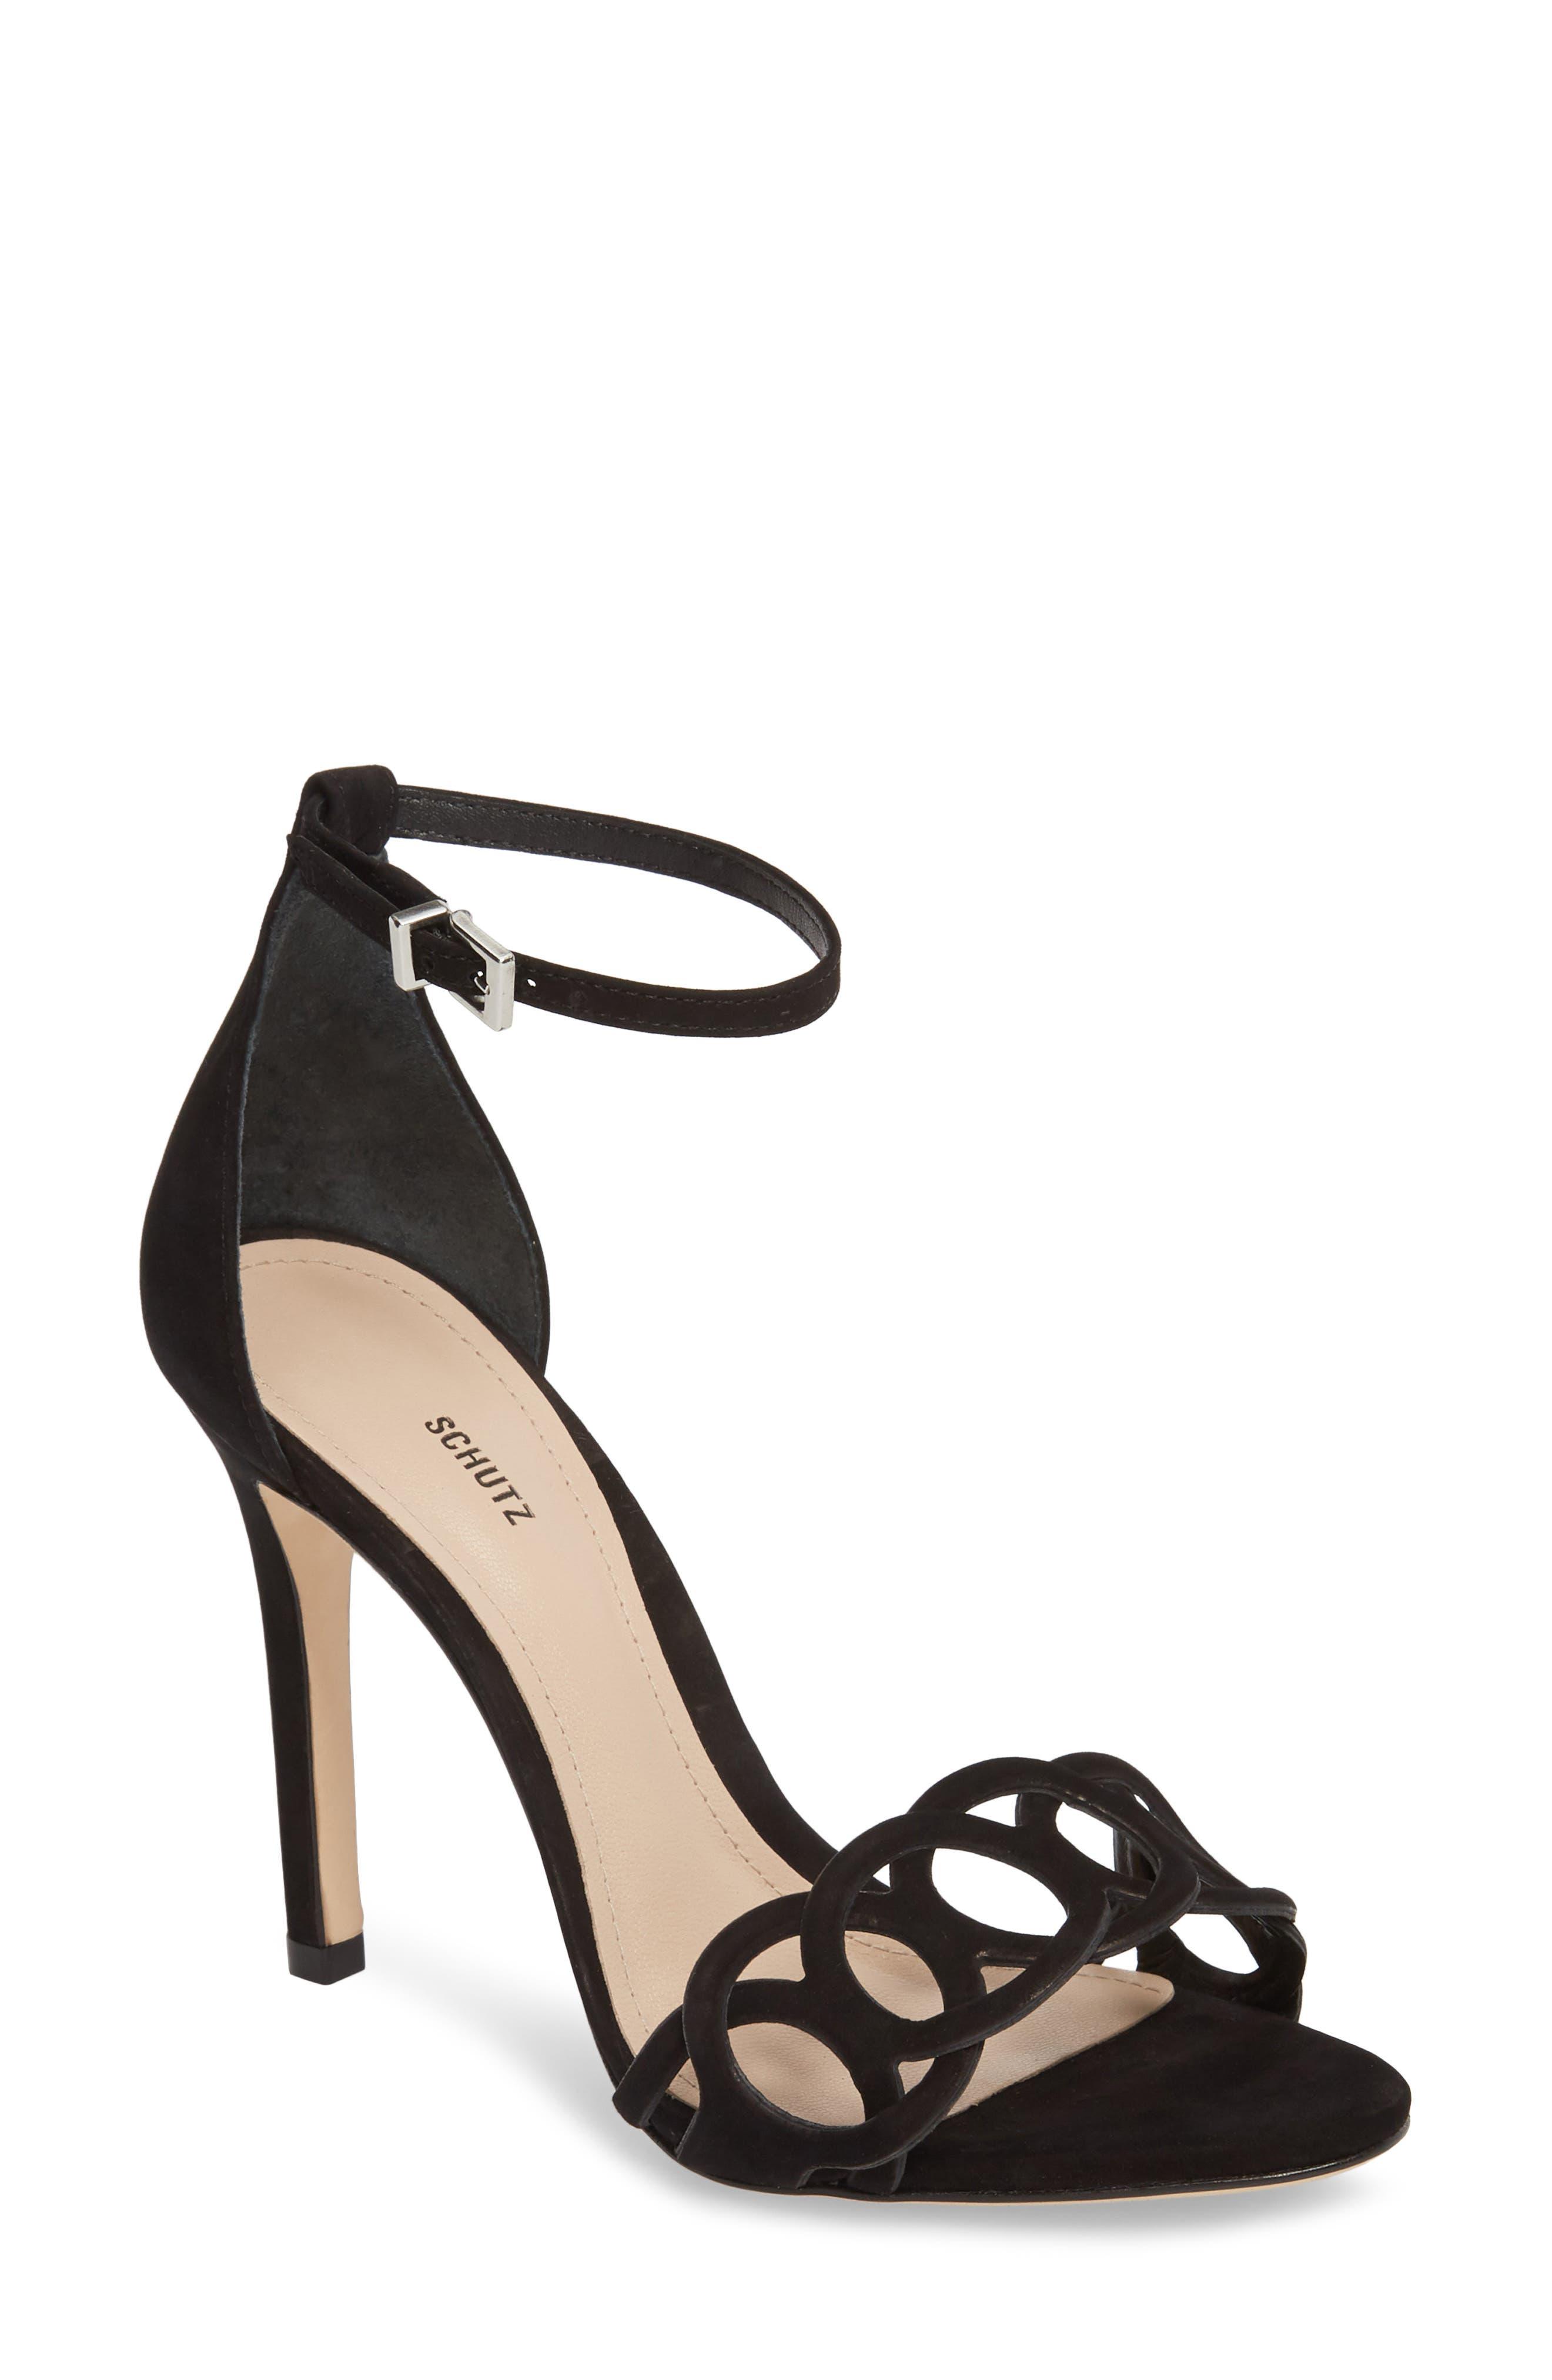 Sthefany Ankle Strap Sandal,                             Main thumbnail 1, color,                             BLACK LEATHER